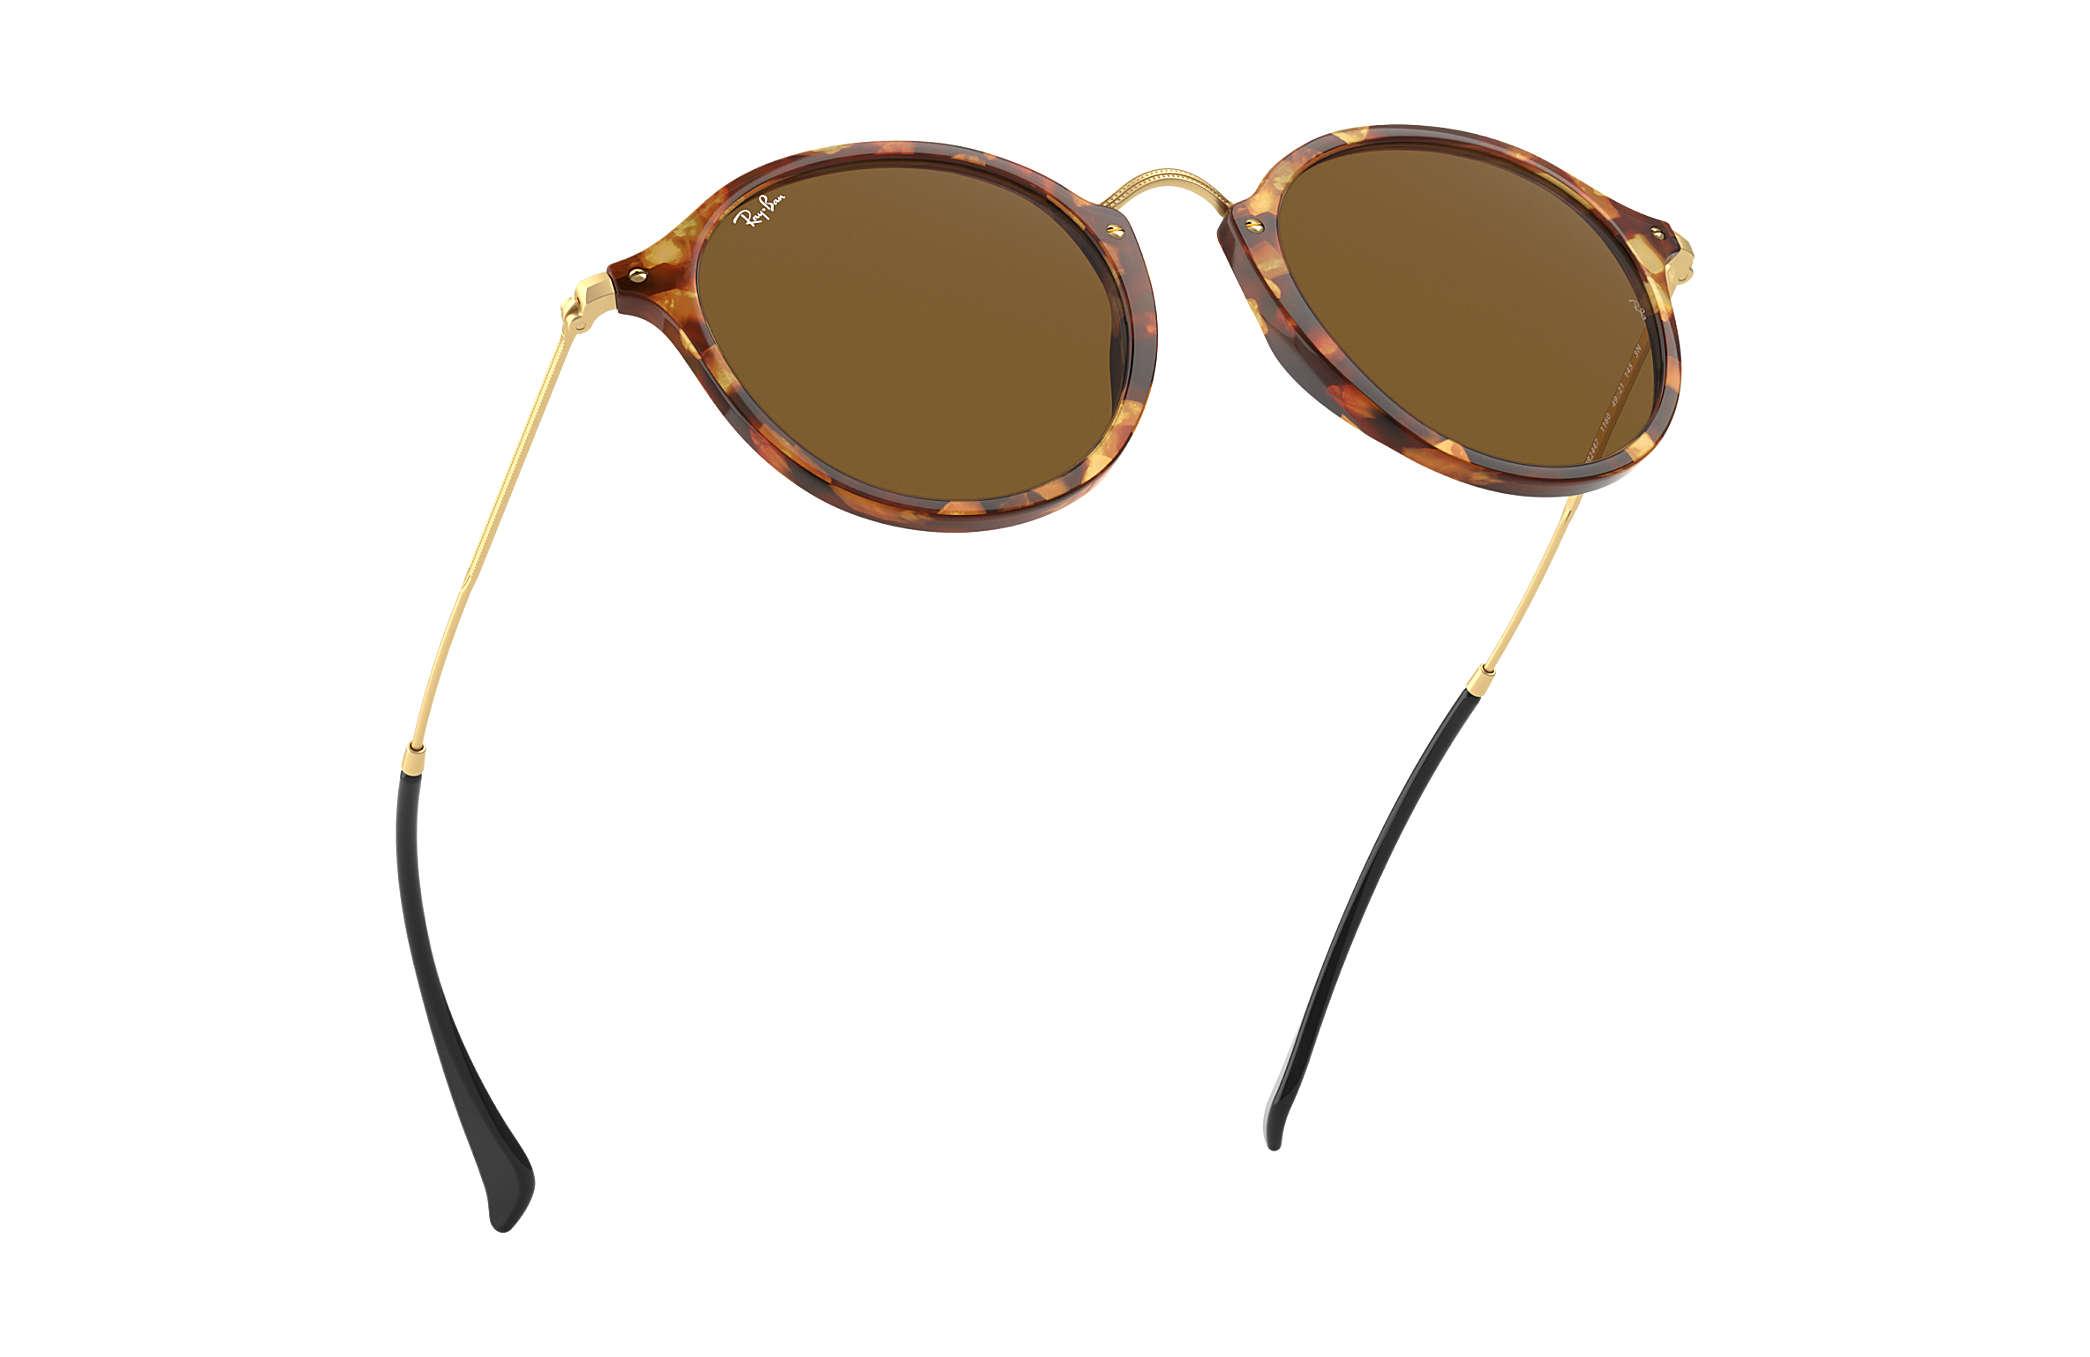 040aa9190f6 ... sunglasses rb2447 901 4o 49  ray ban 0rb2447 round fleck tortoise gold  sun ...